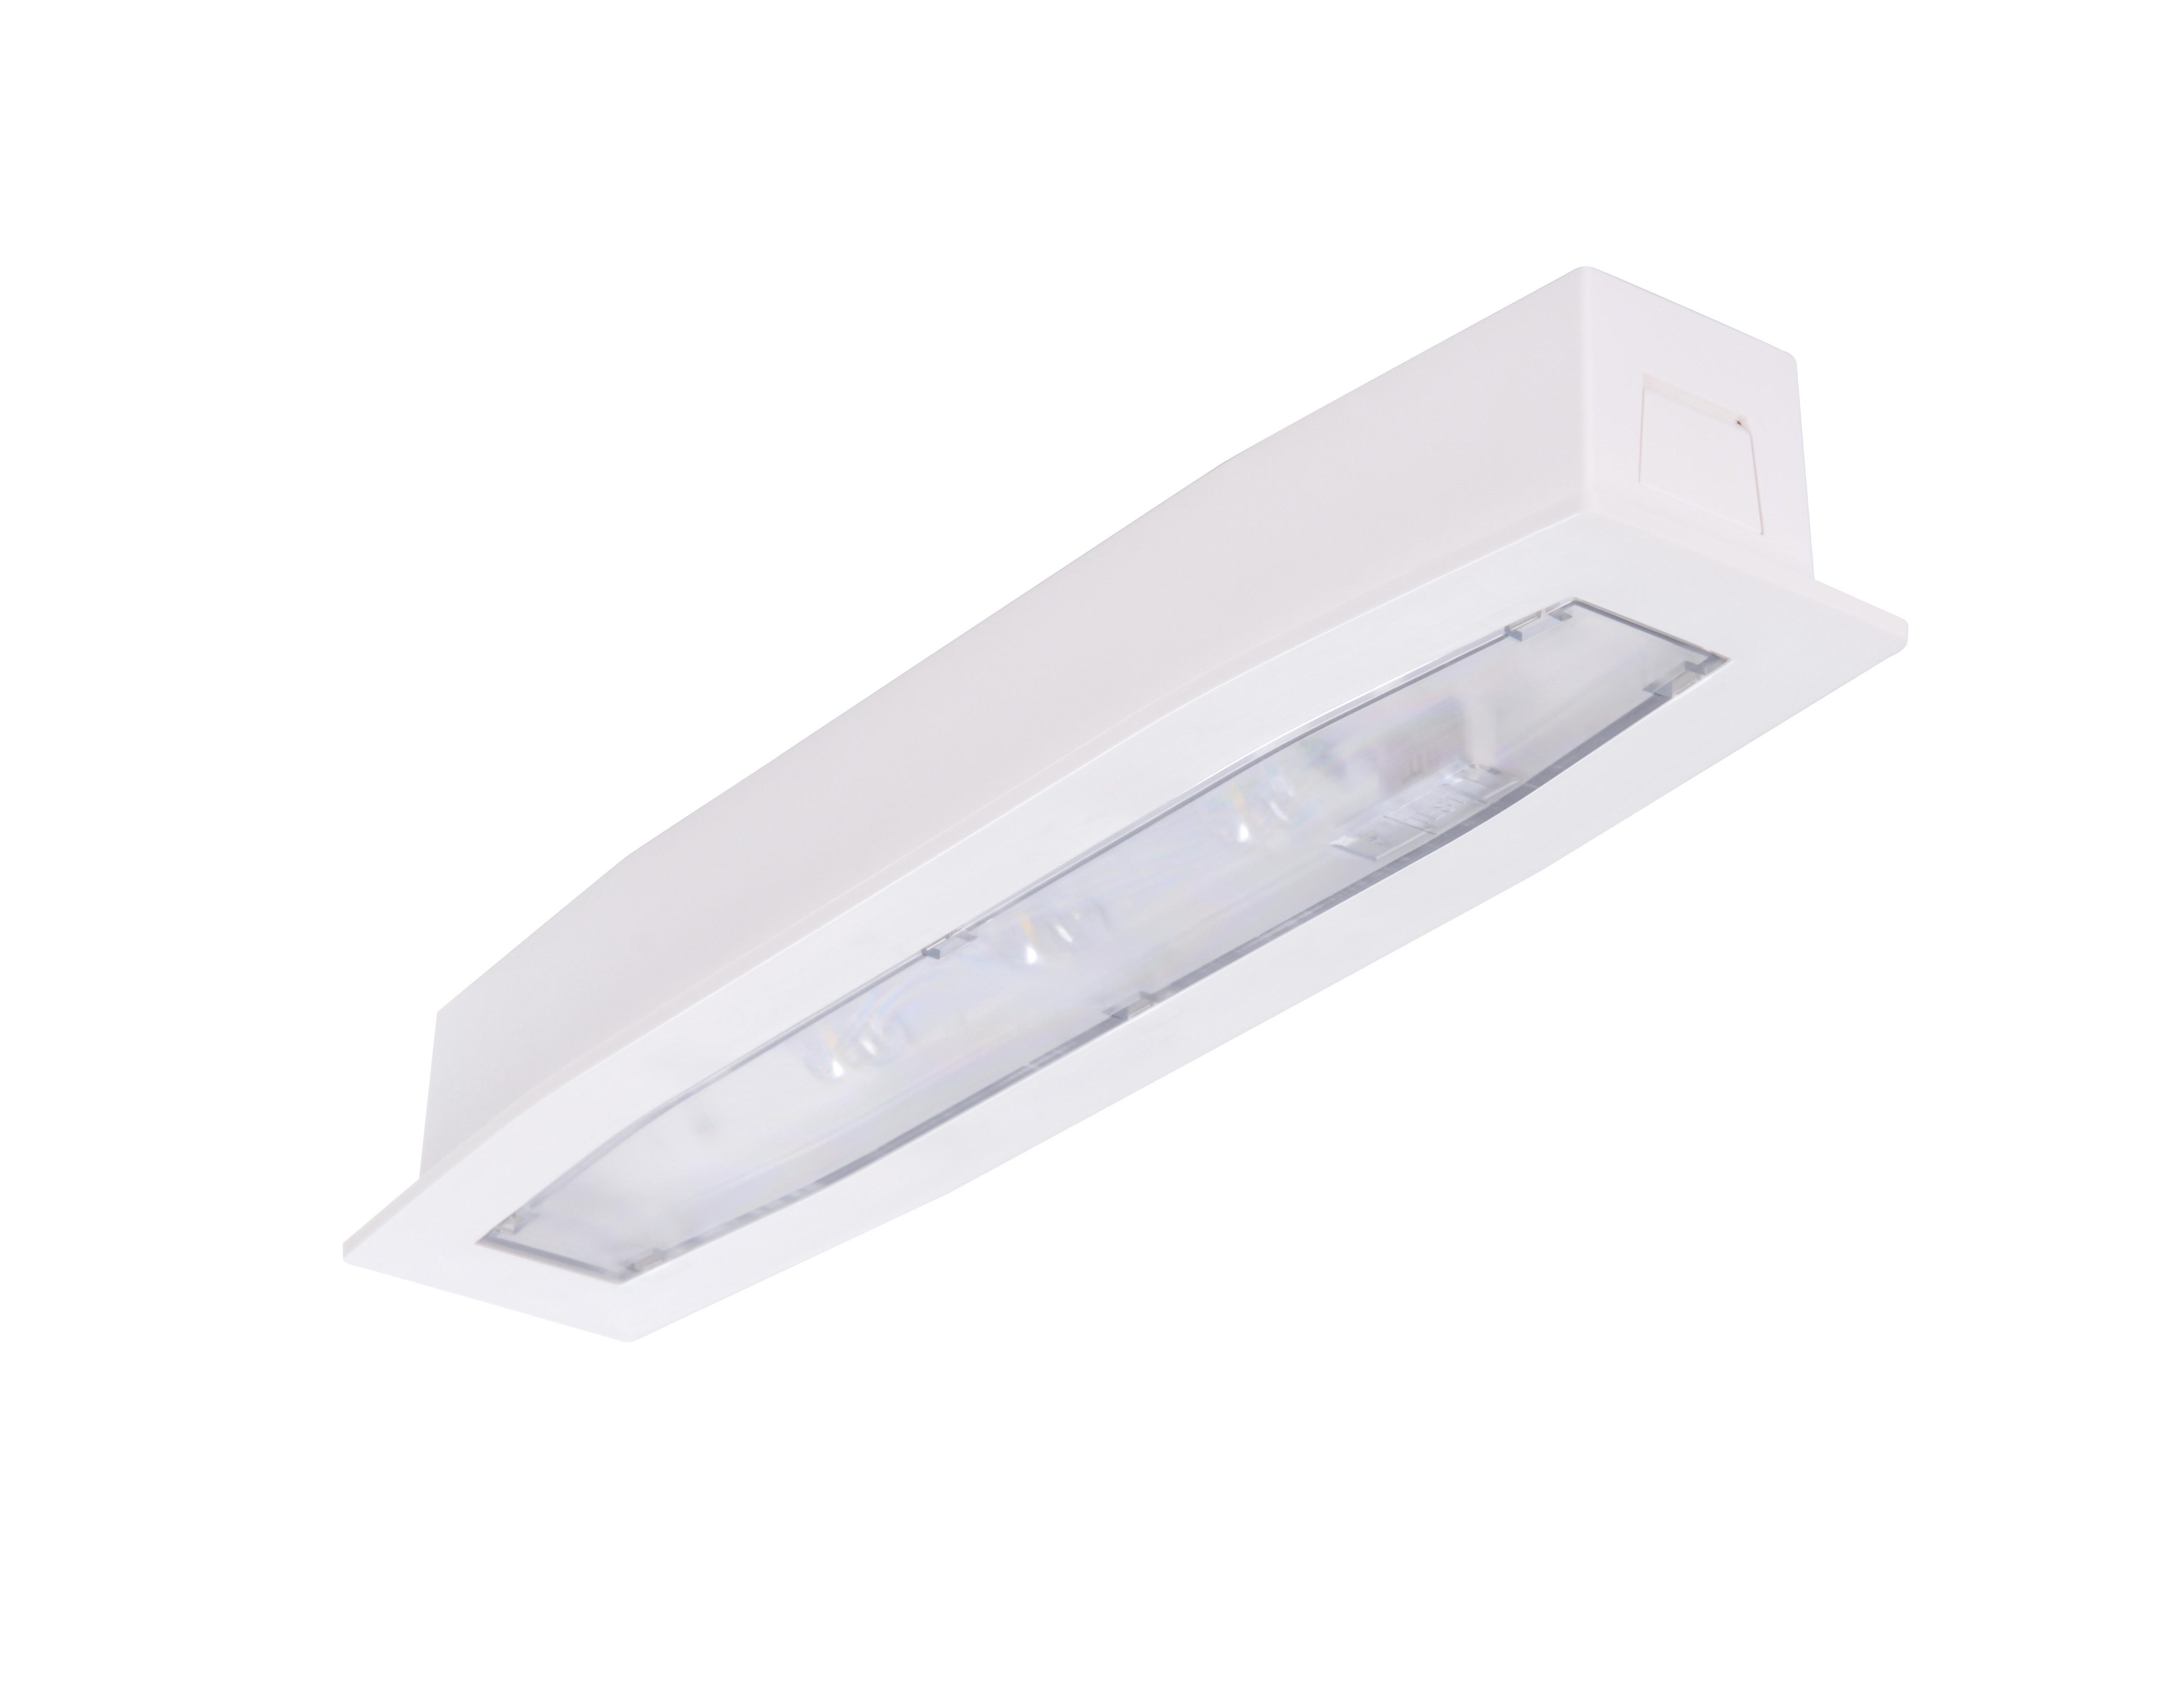 Lampa emergenta led Intelight 94521   3h mentinut test automat 3